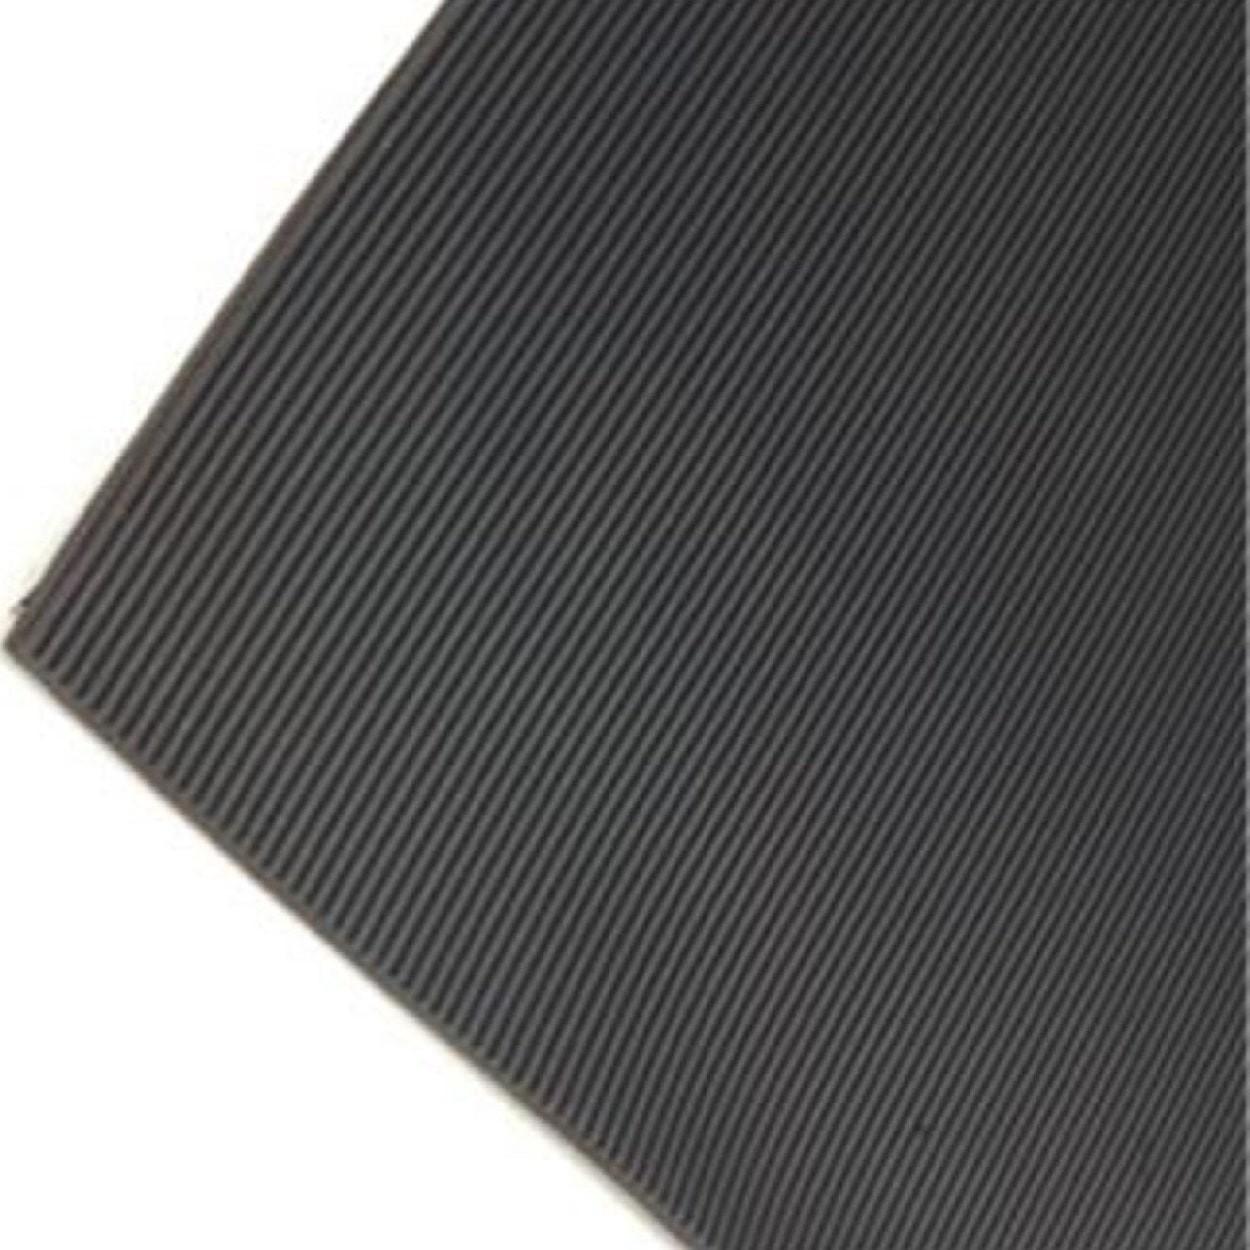 Fine Ribbed Rubber Flooring Rolls Arkmat